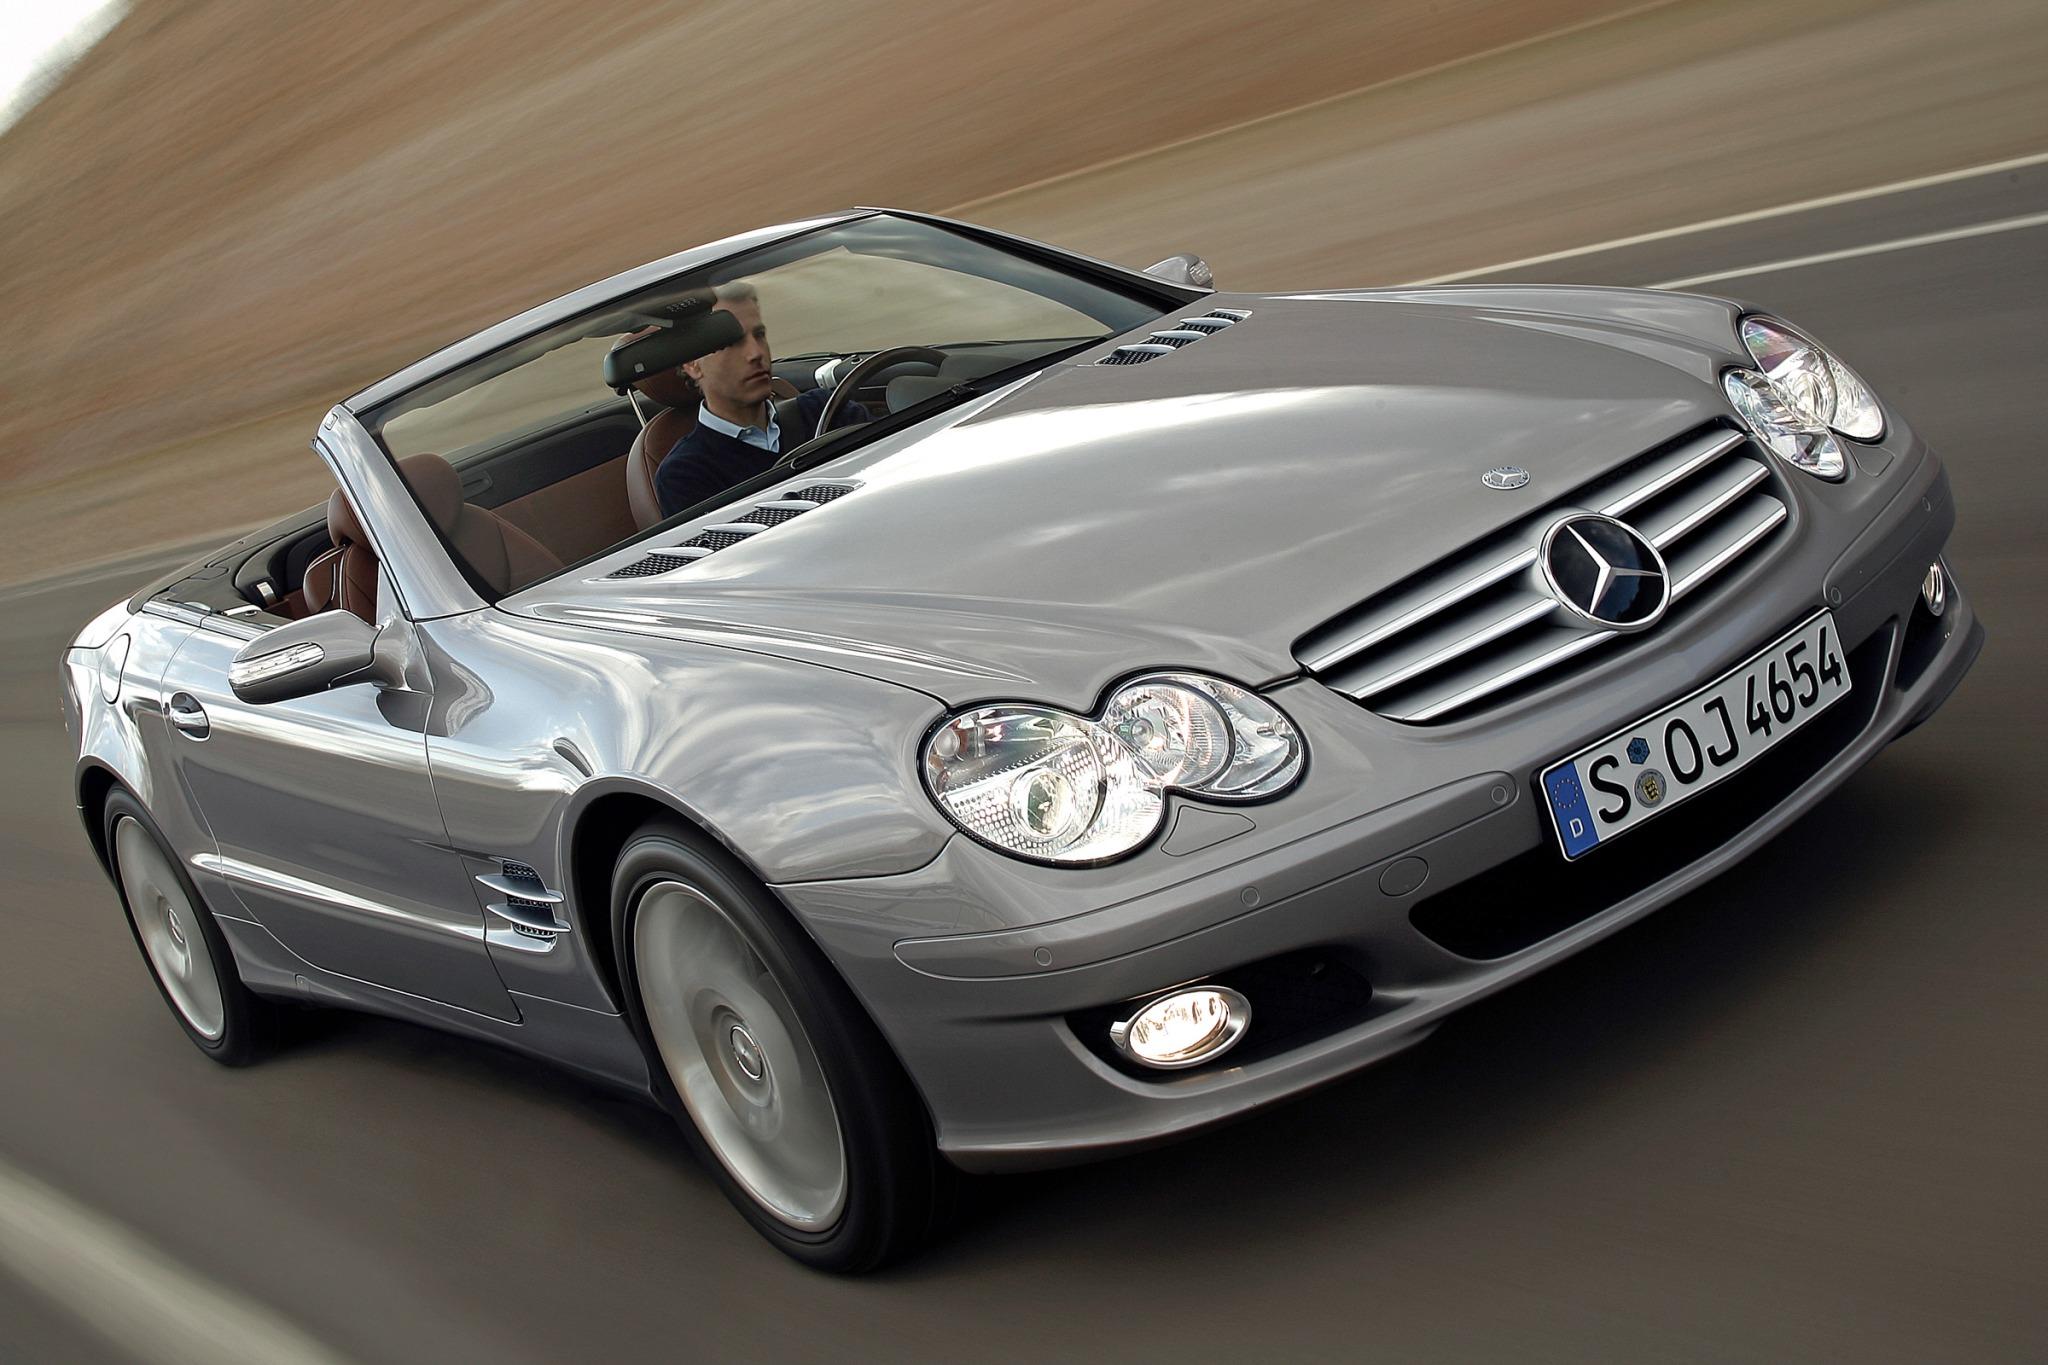 2007 Mercedes-Benz SL-Class SL55 AMG VIN Lookup - AutoDetective